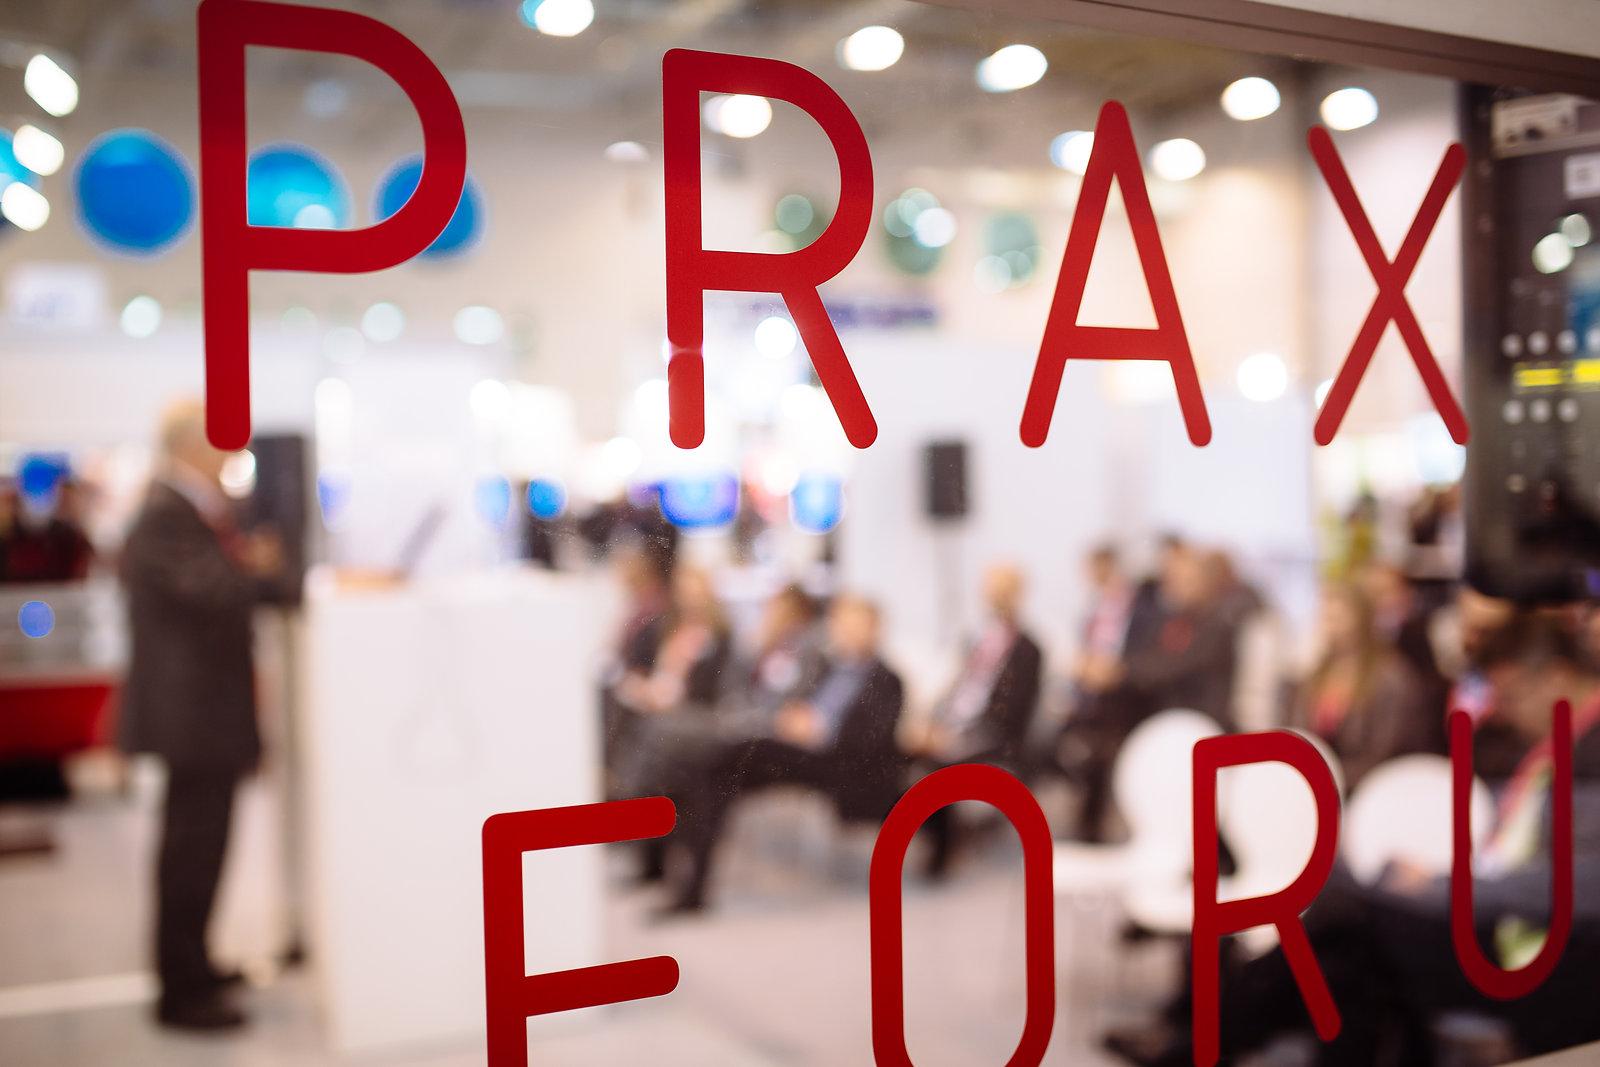 Eventfotograf-Business-Events-Veranstaltungsfotograf-Eventfotografie